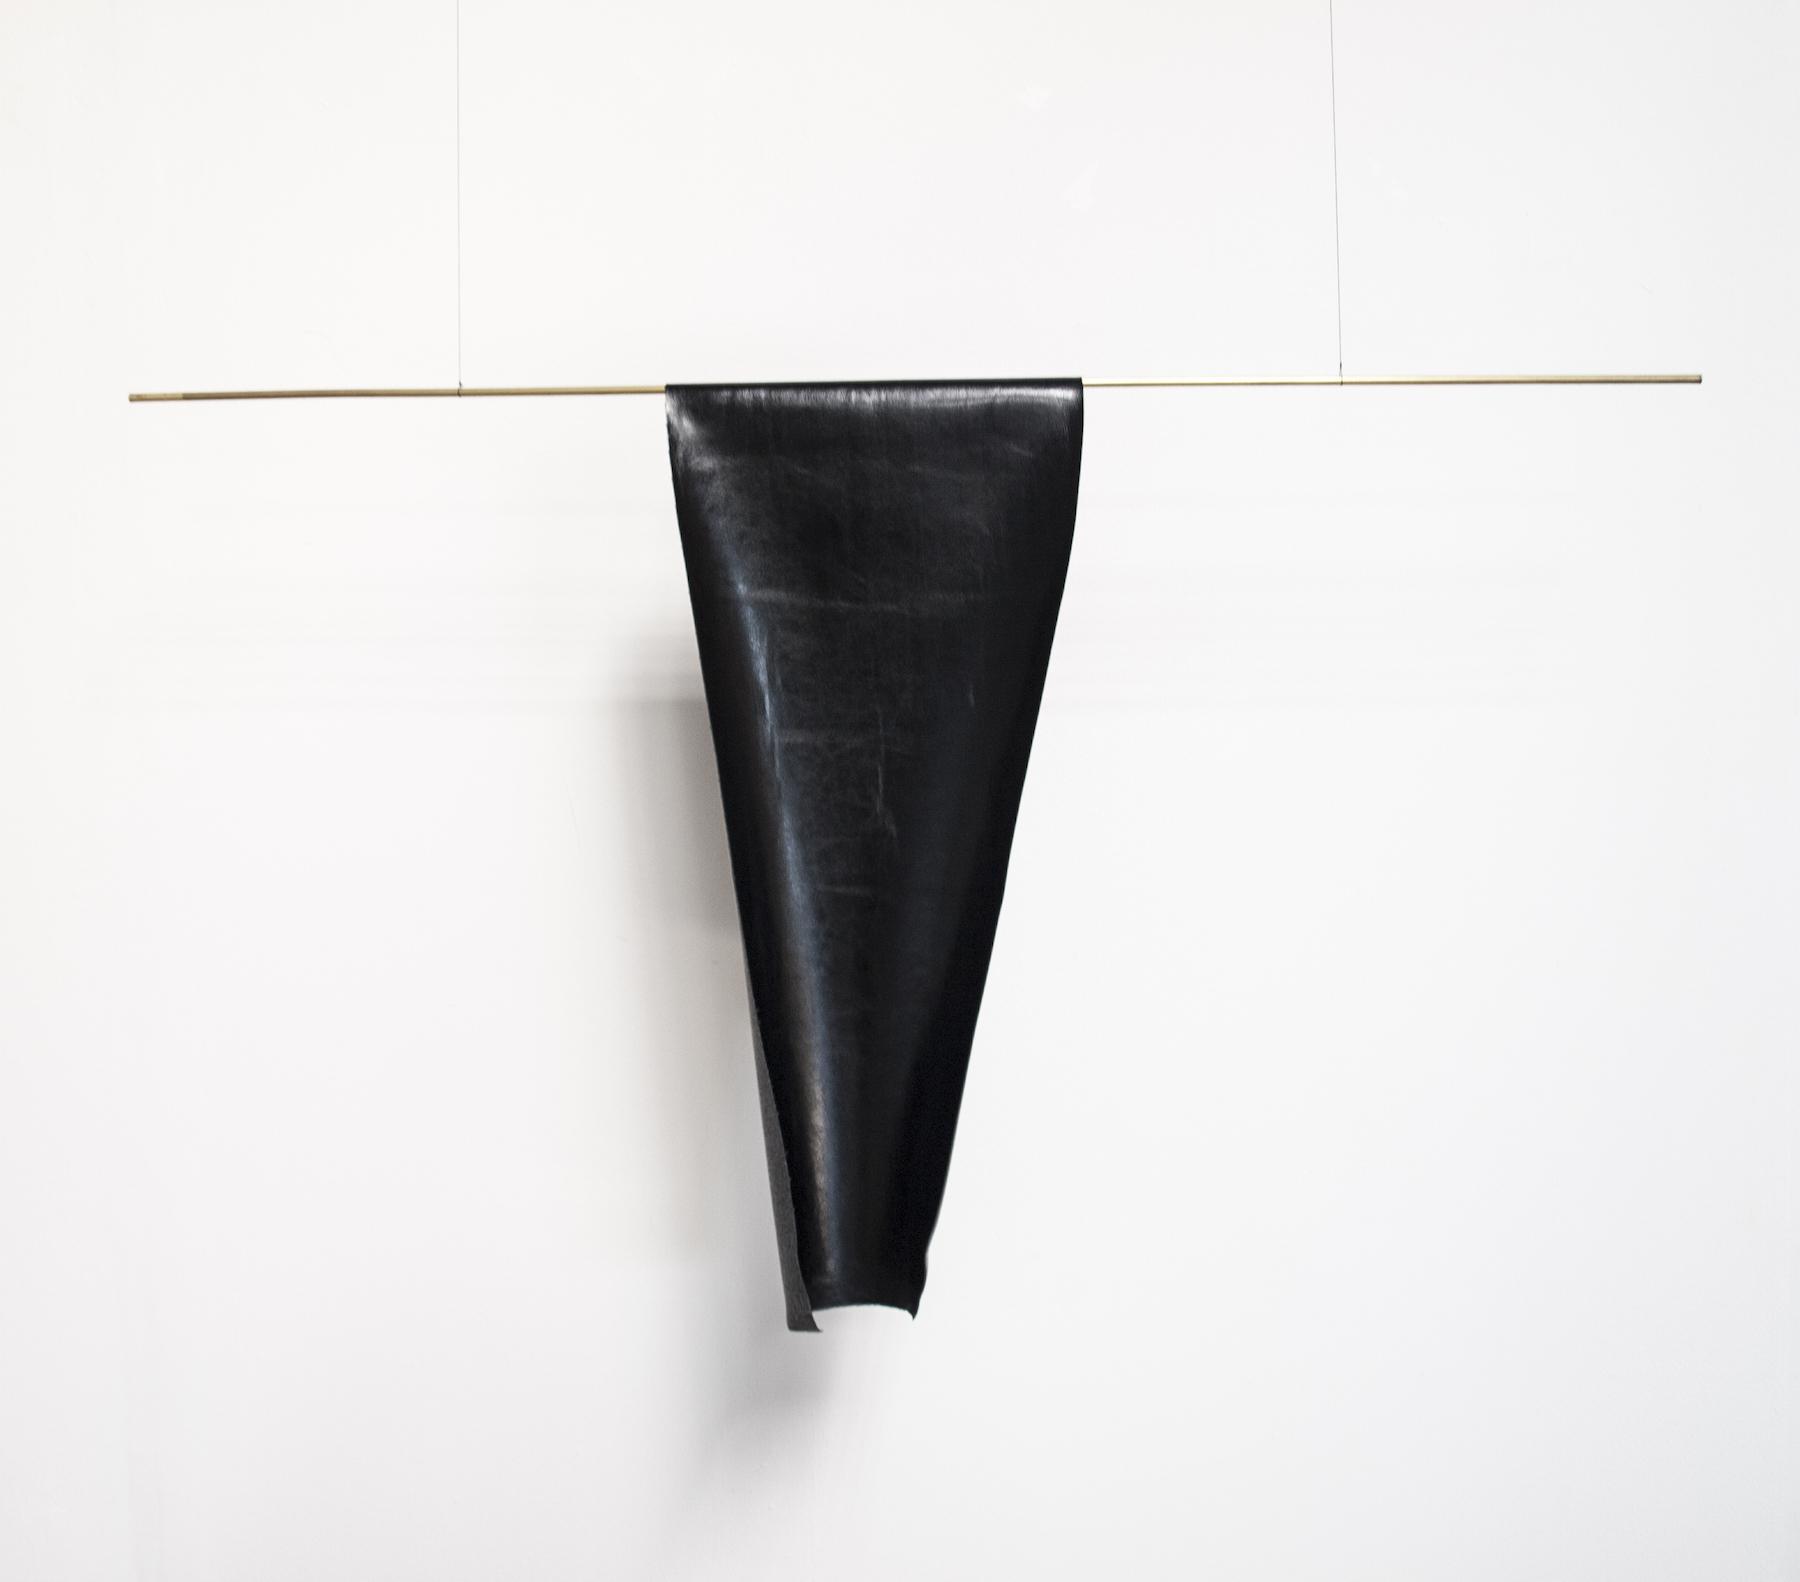 "Kama Sokolnicka, ""Jet lag"", 2013 (źródło: materiały prasowe organizatora)"